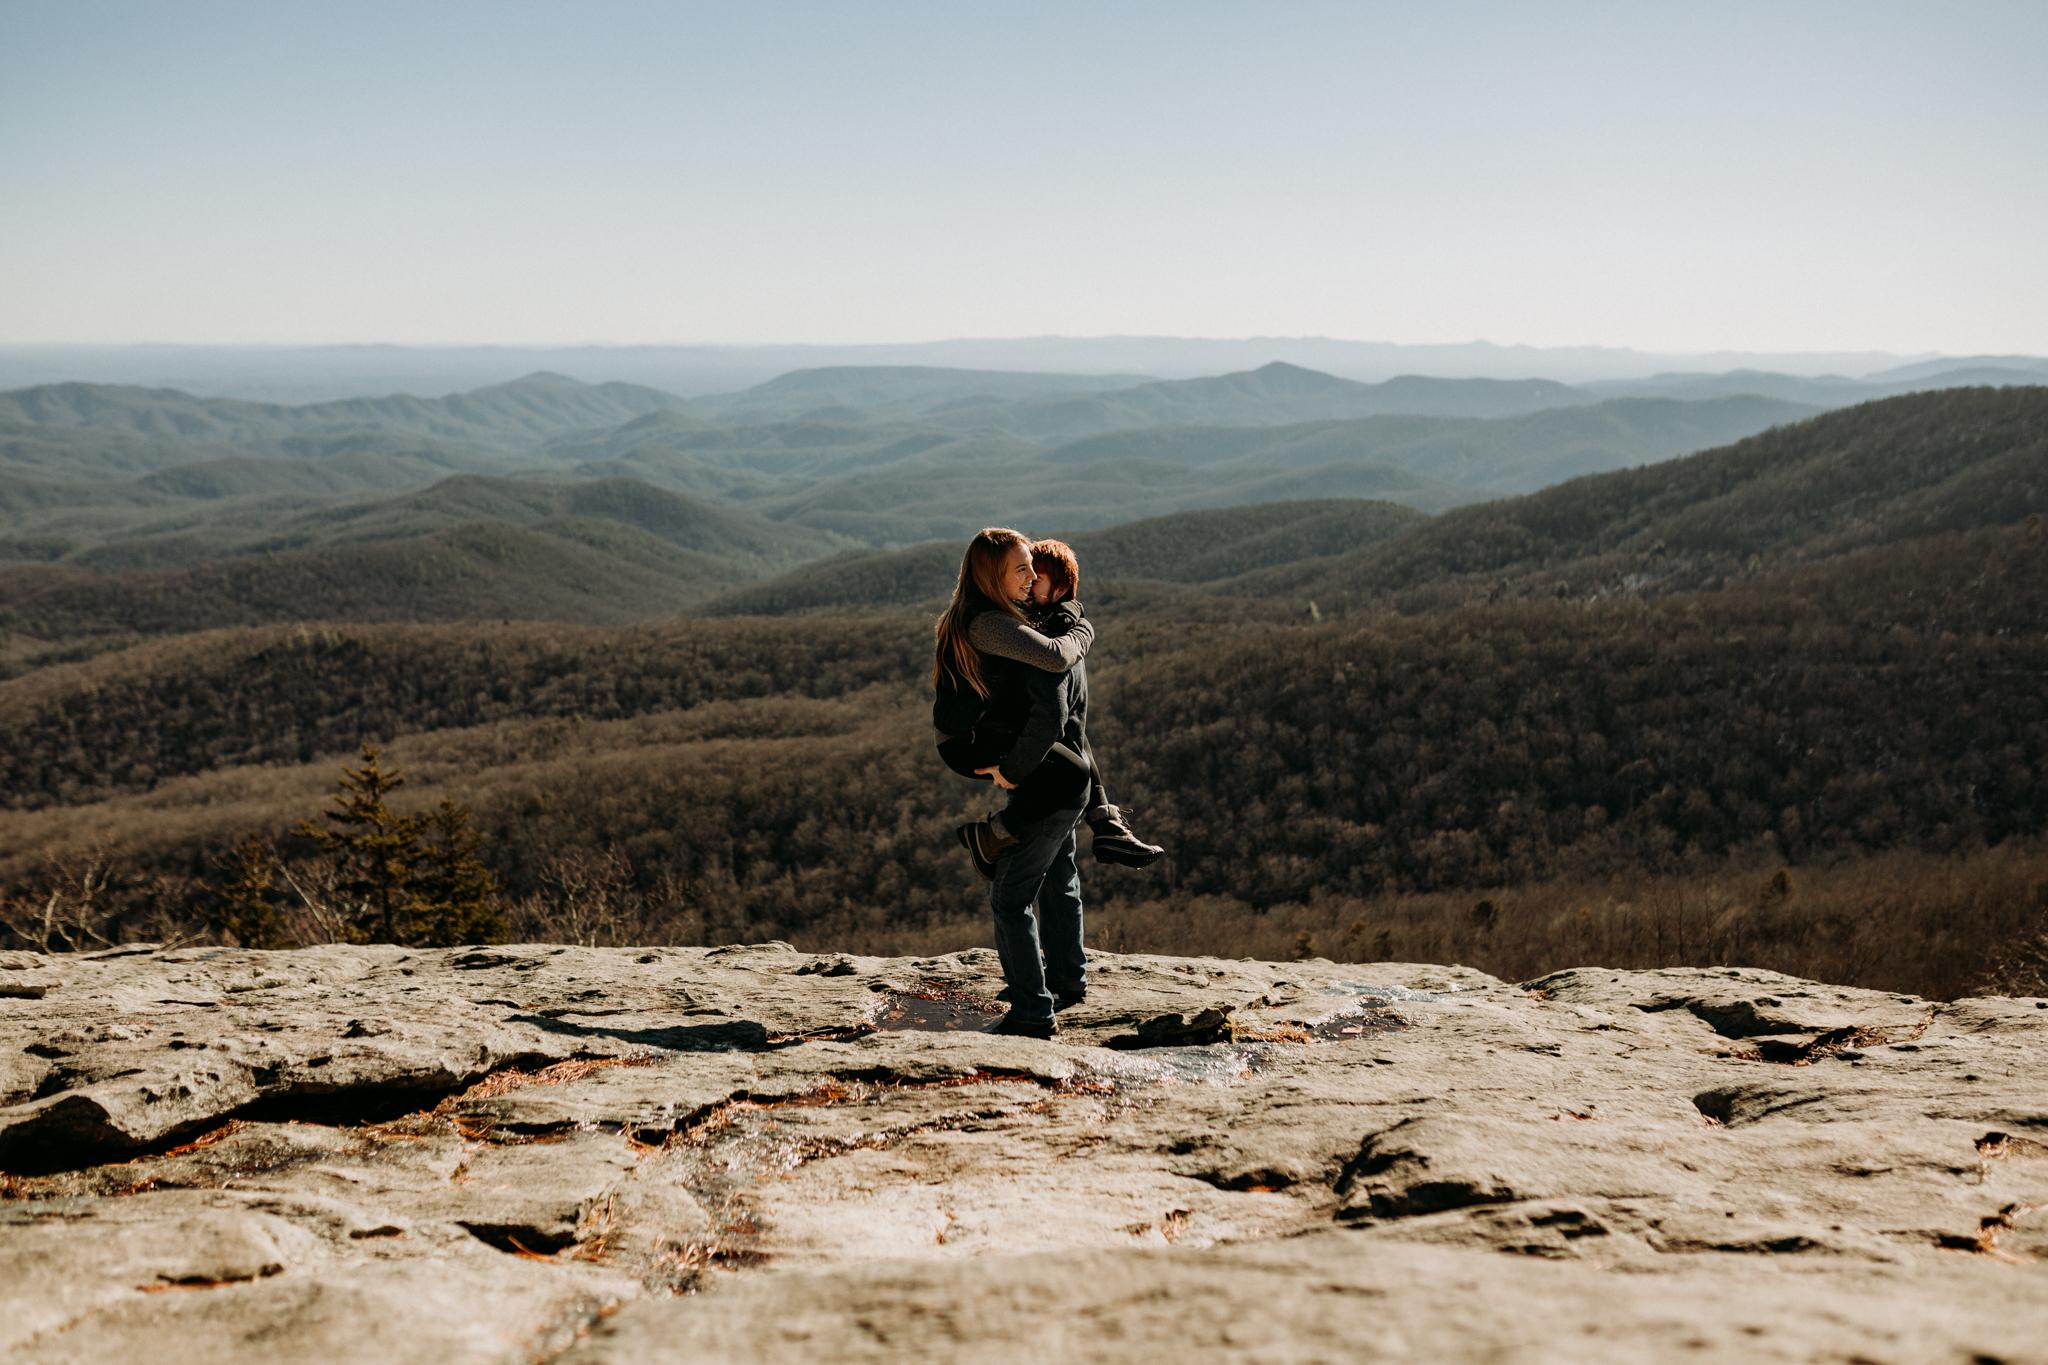 MonicaLeavellPhoto-AshleyMitch-NorthCarolina-Adventure-Engagement-Photographer-1.jpg